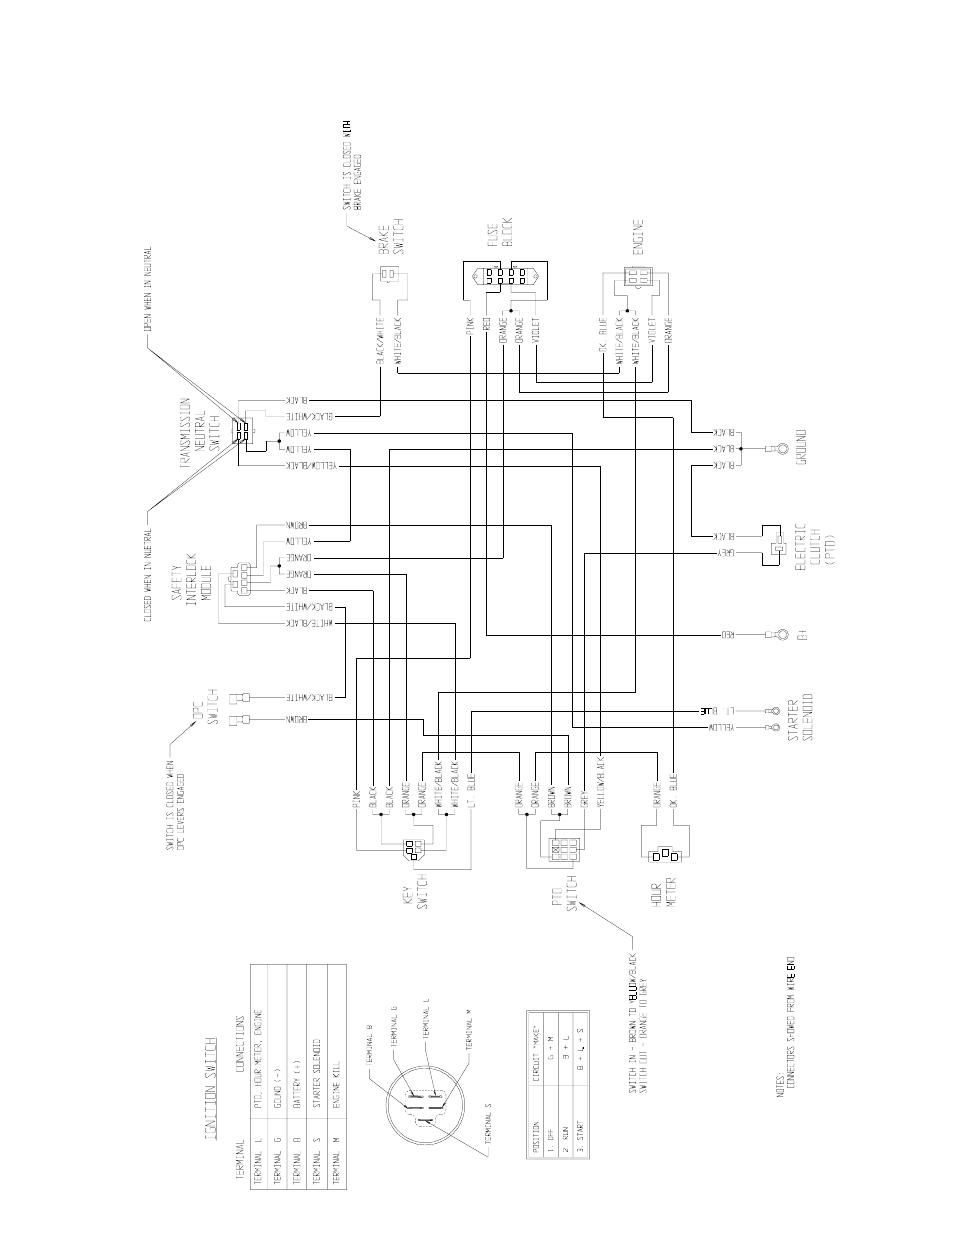 hight resolution of exmark model lz28ka605 wiring schematic wiring library exmark model lz28ka605 wiring schematic